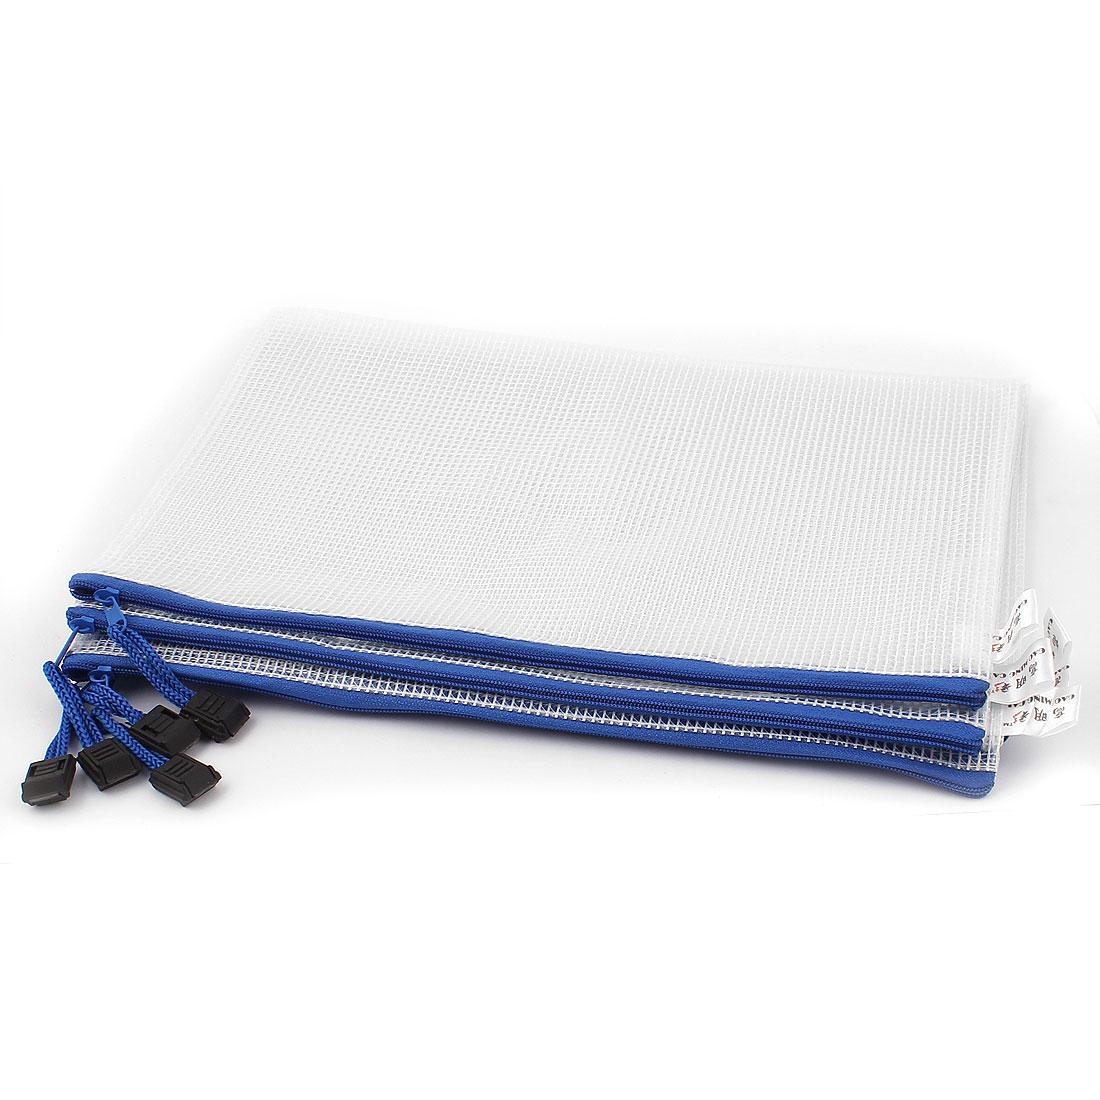 Zipper Closure B5 Paper Document Protective File Bags Storage Folder 5pcs